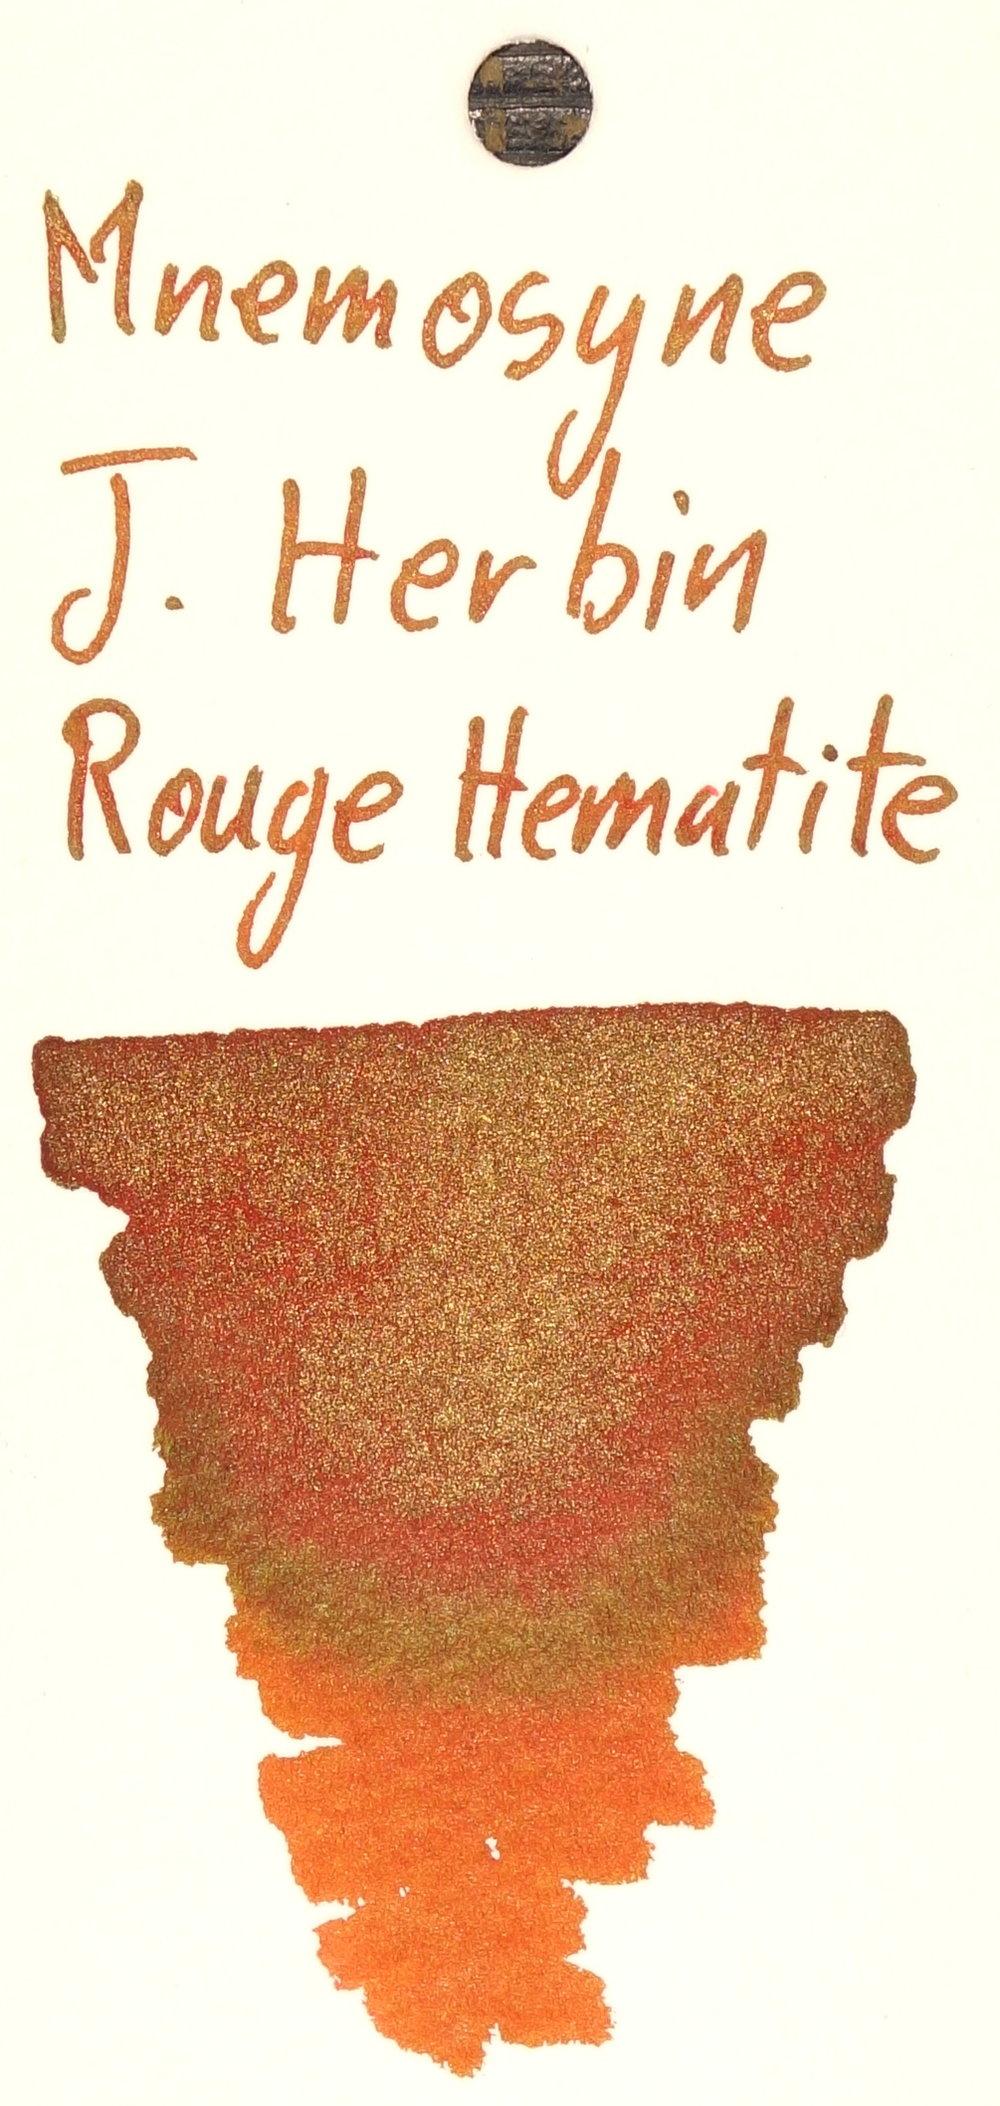 J. Herbin Rouge Hematite Mnemosyne.JPG